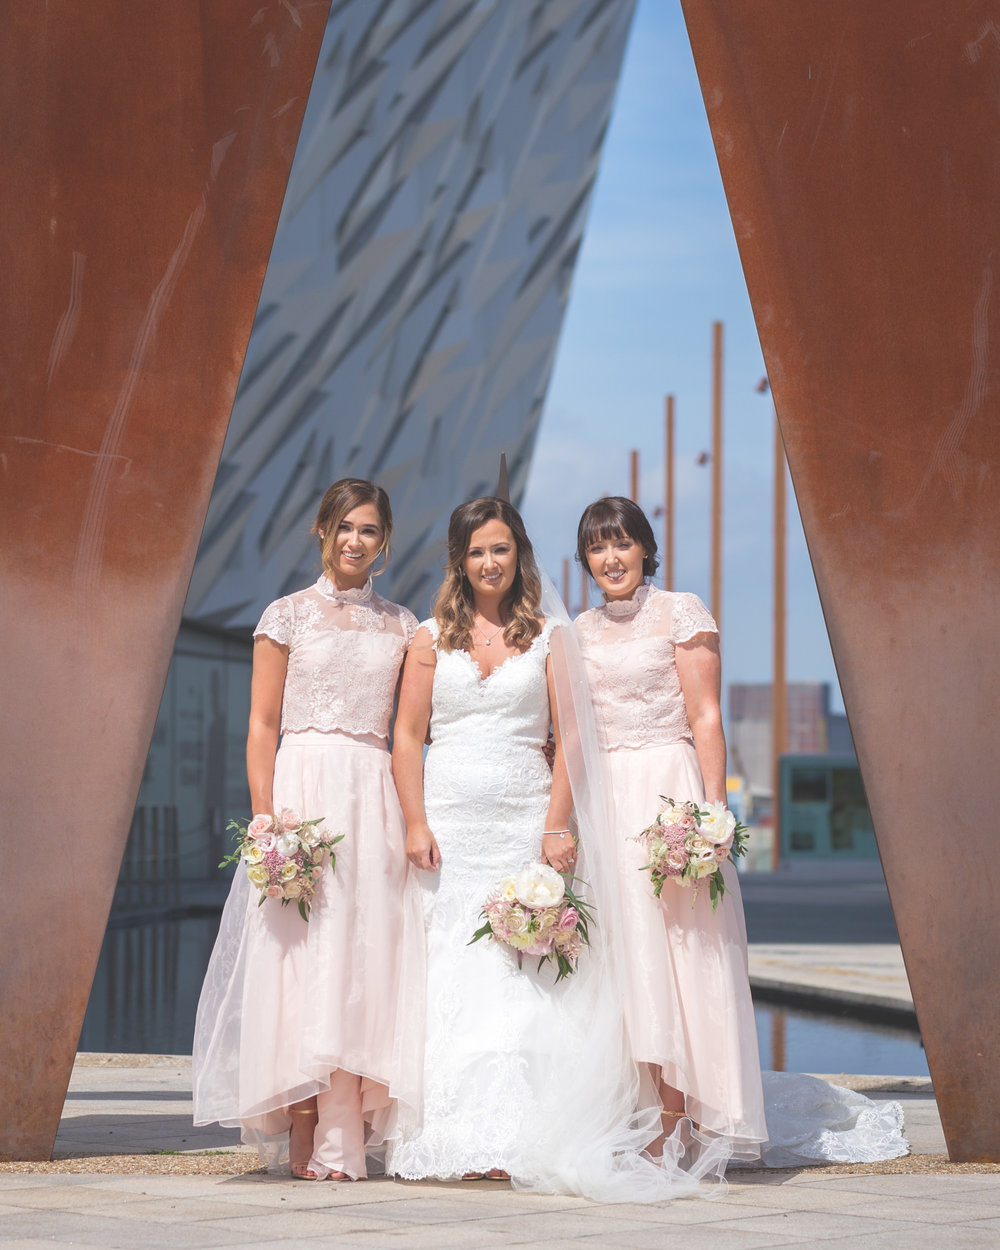 Brian McEwan | Northern Ireland Wedding Photographer | Rebecca & Michael | Portraits-64.jpg